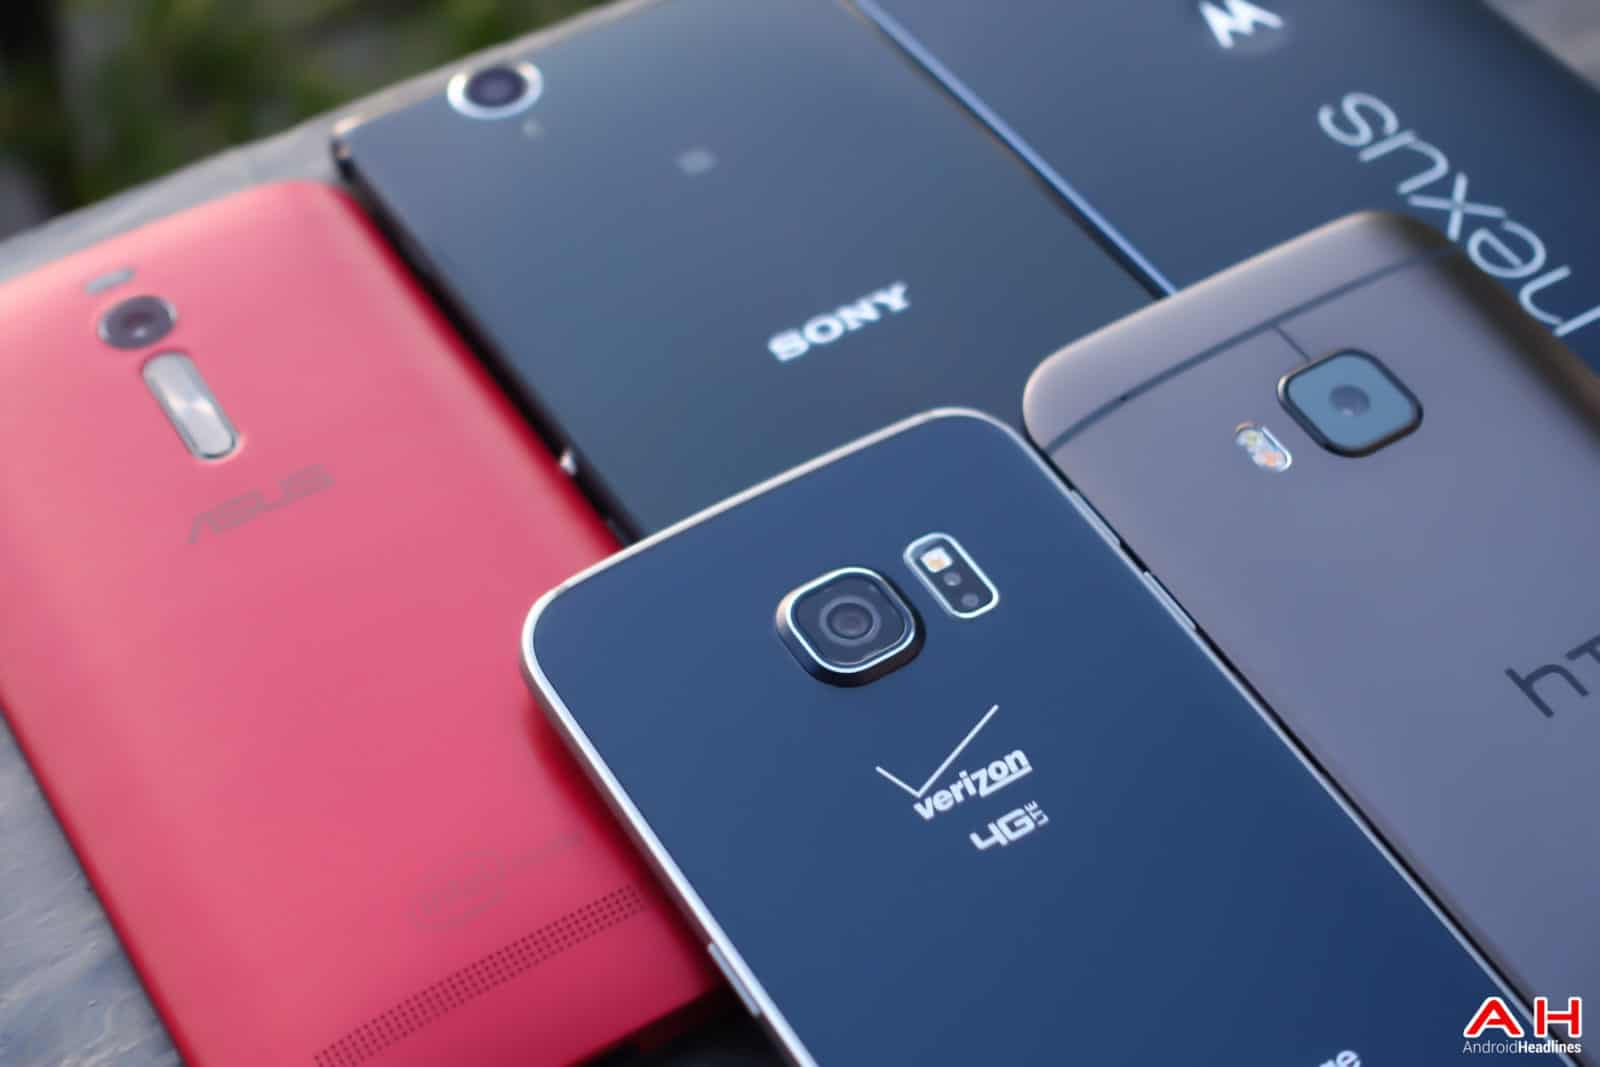 AH AH Android Samrtphones Nexus Samsung Galaxy S6 HTC One M9 Sony OEM logos-21 May 3rd Batch 2-8